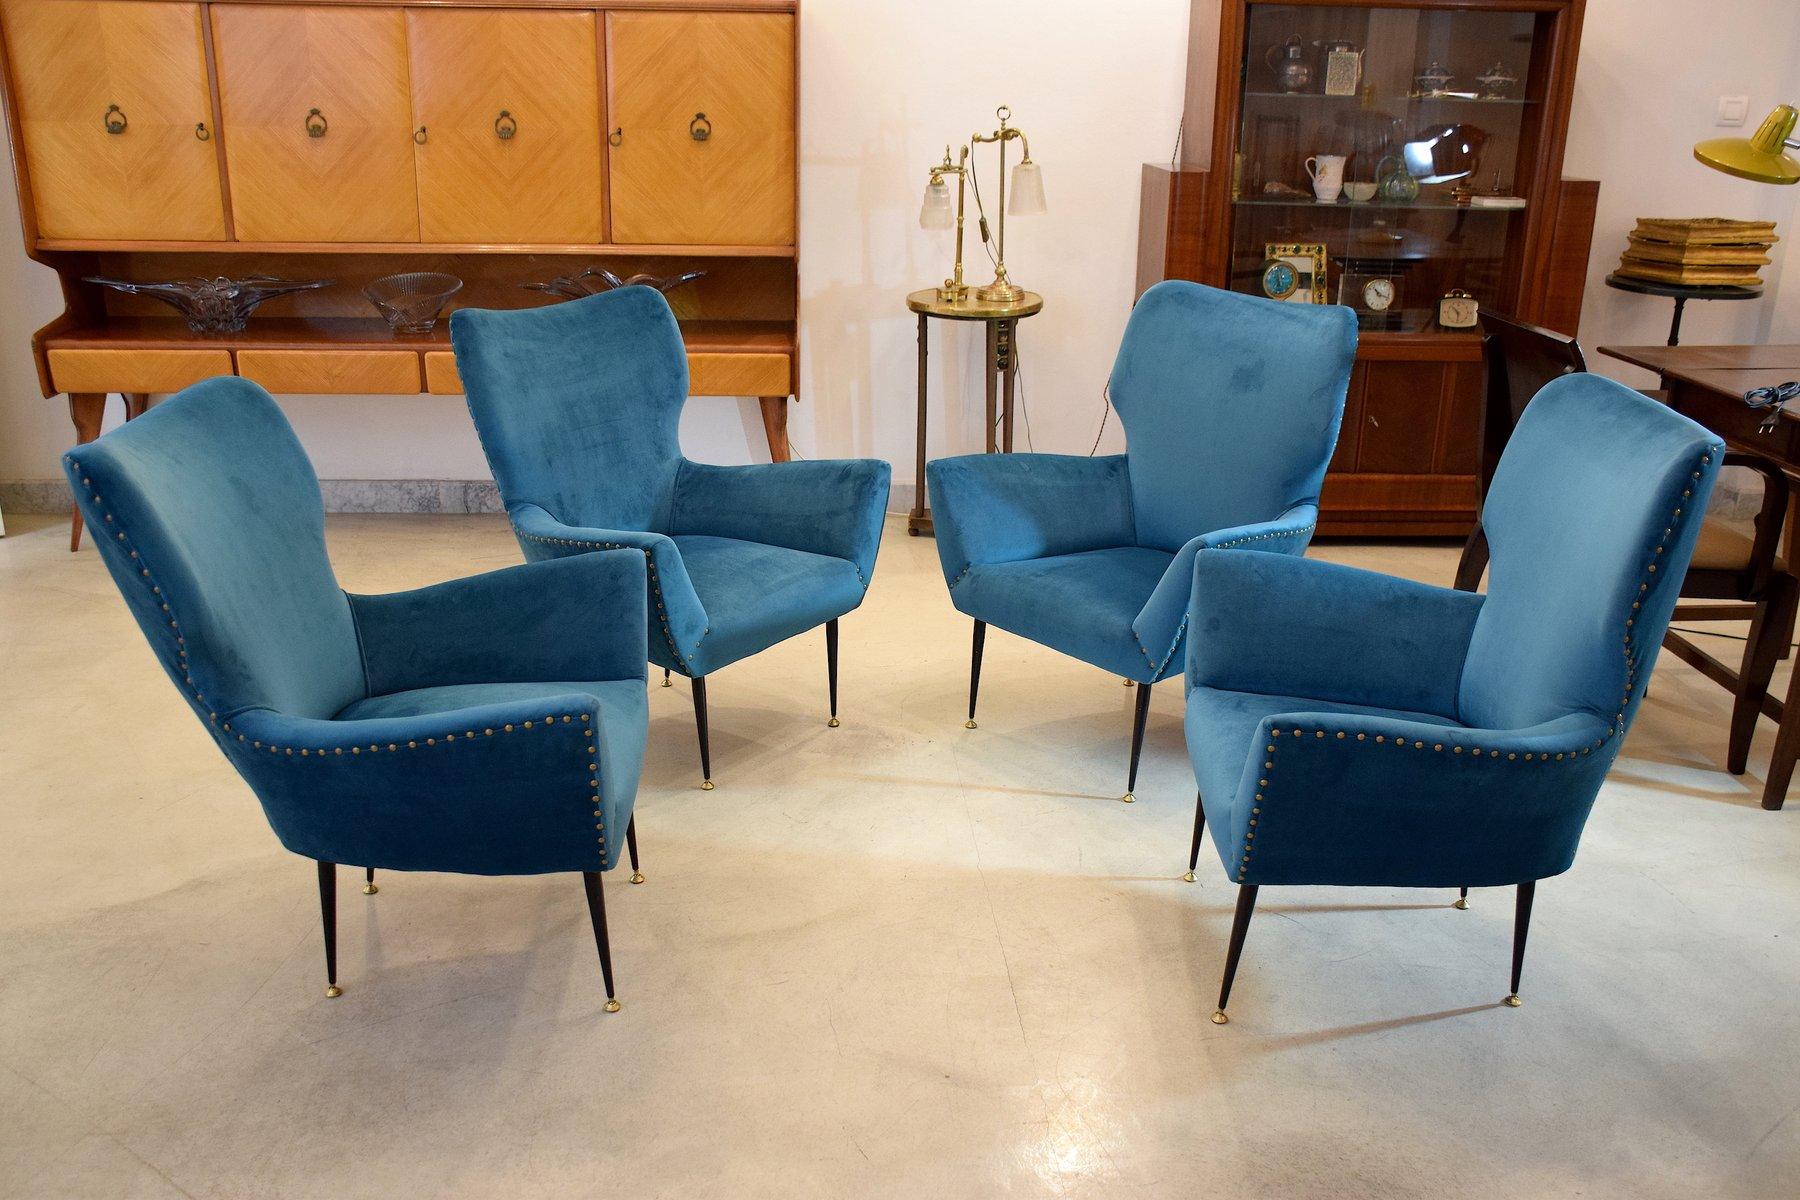 geschwungene italienische sessel 1950er 2er set bei. Black Bedroom Furniture Sets. Home Design Ideas